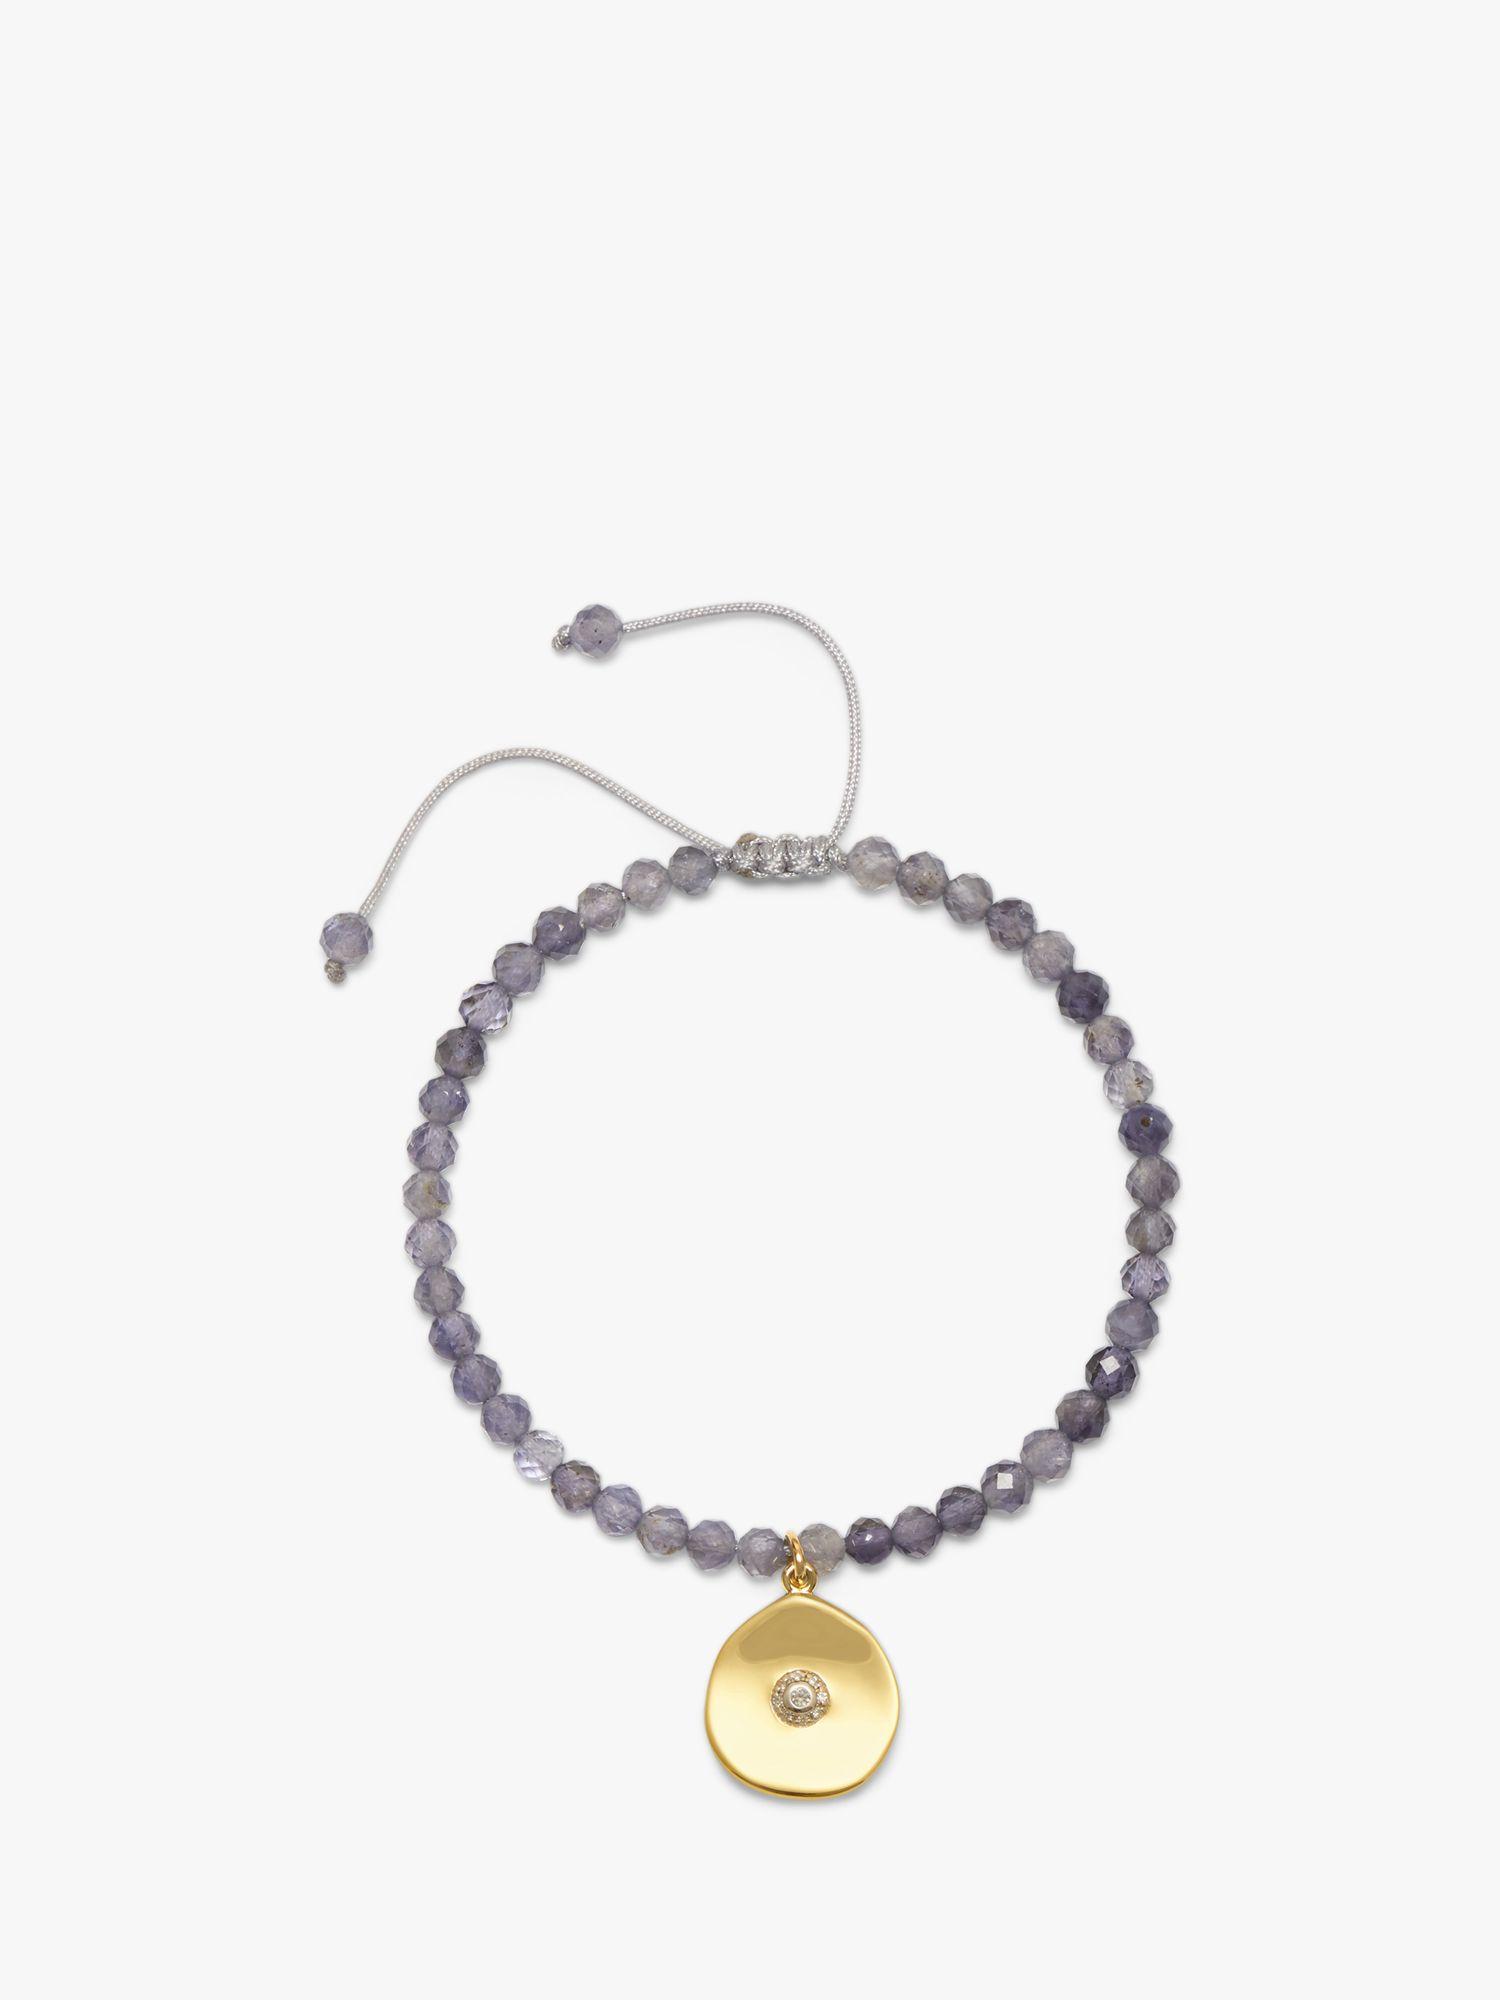 Lola Rose Lola Rose Curio Semi-Precious Bead Coin Charm Bracelet